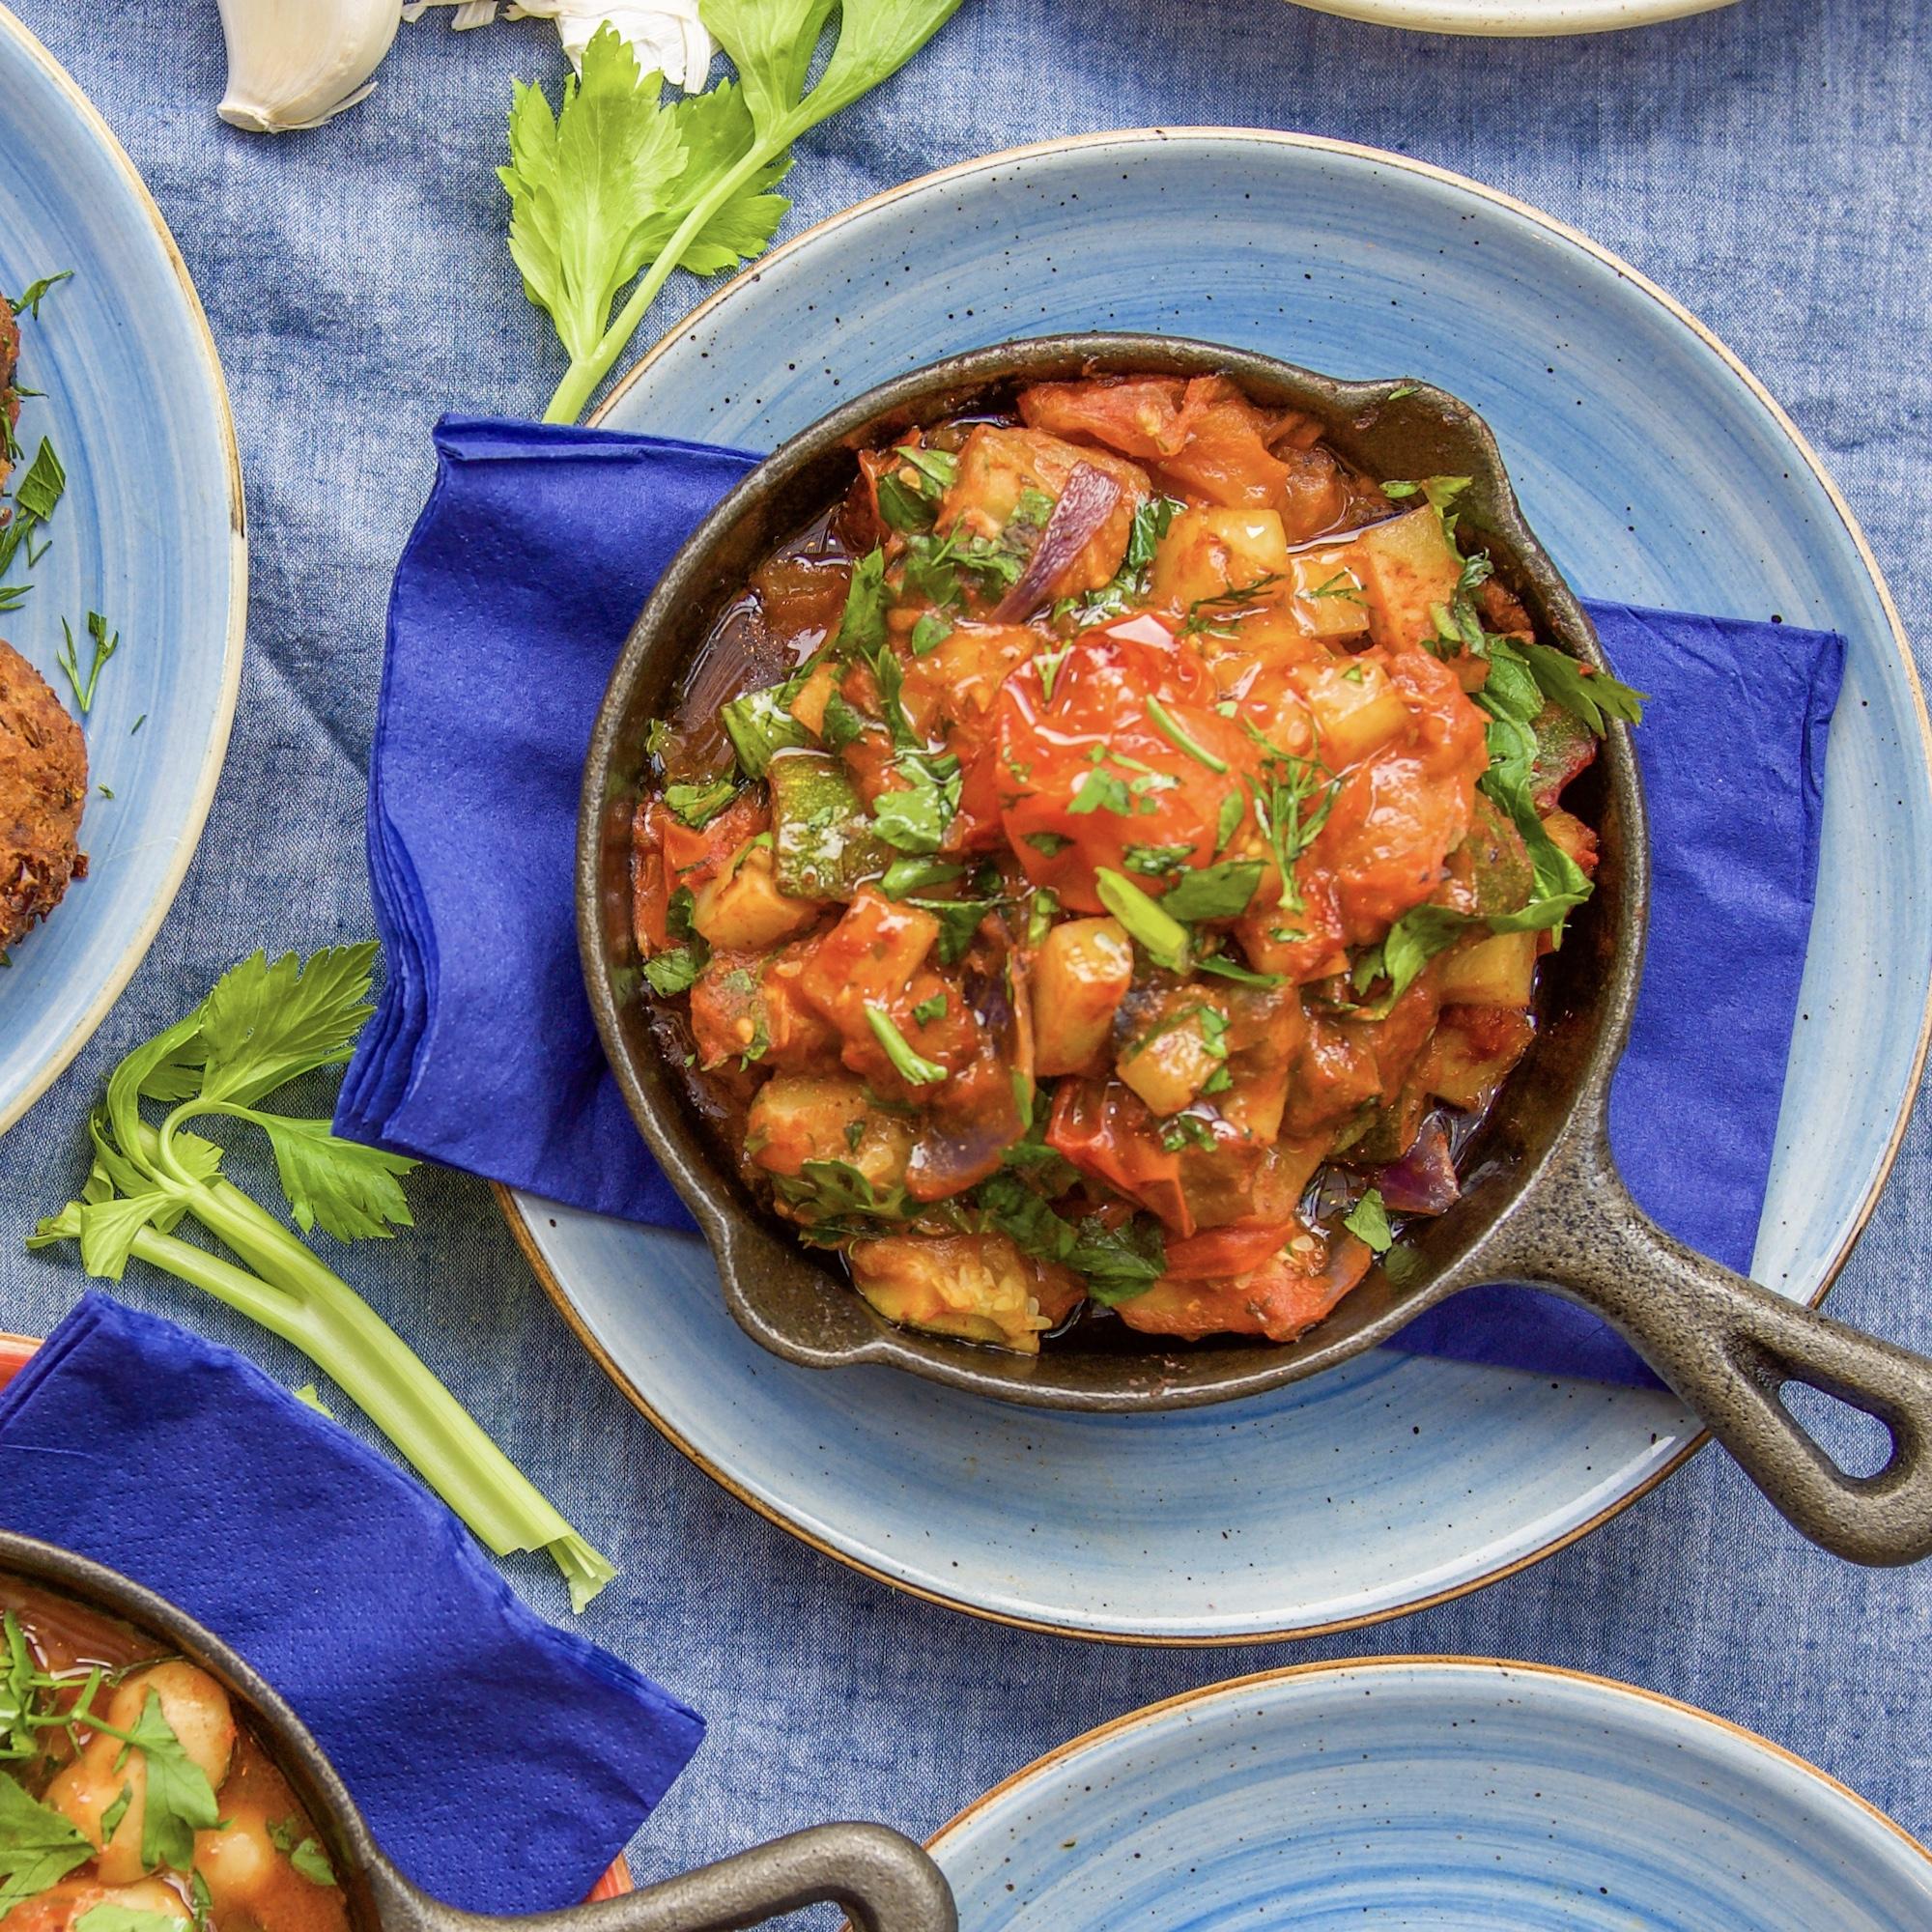 vegan food - greek vegan - vegetable briam